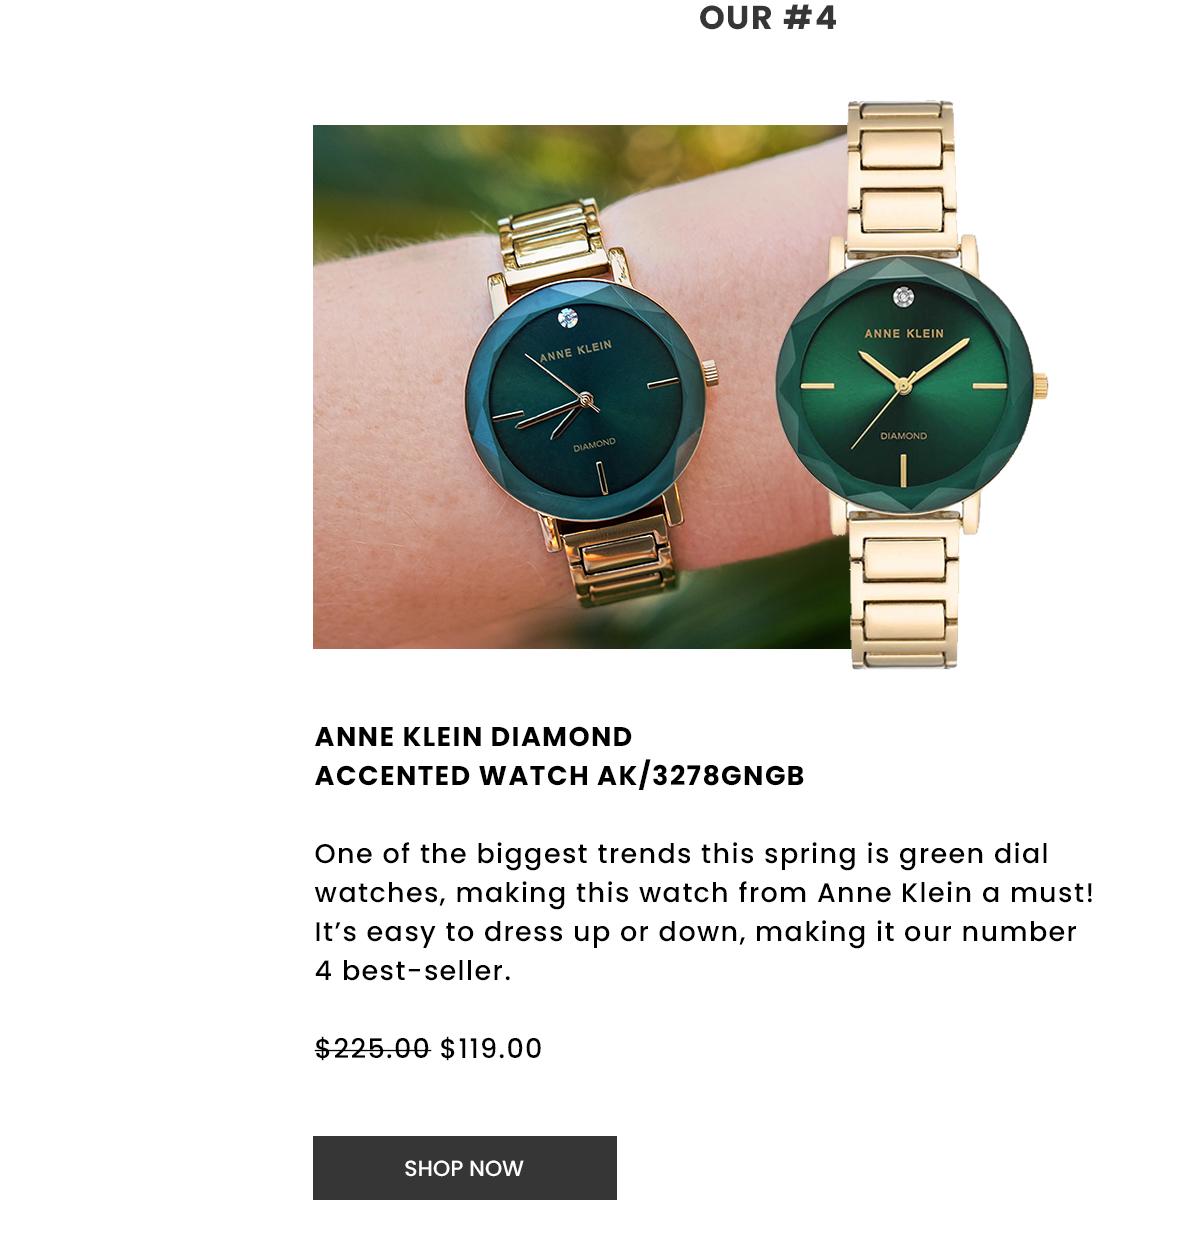 Anne Klein Diamond Accented Watch AK/3278GNGB. Shop Now.